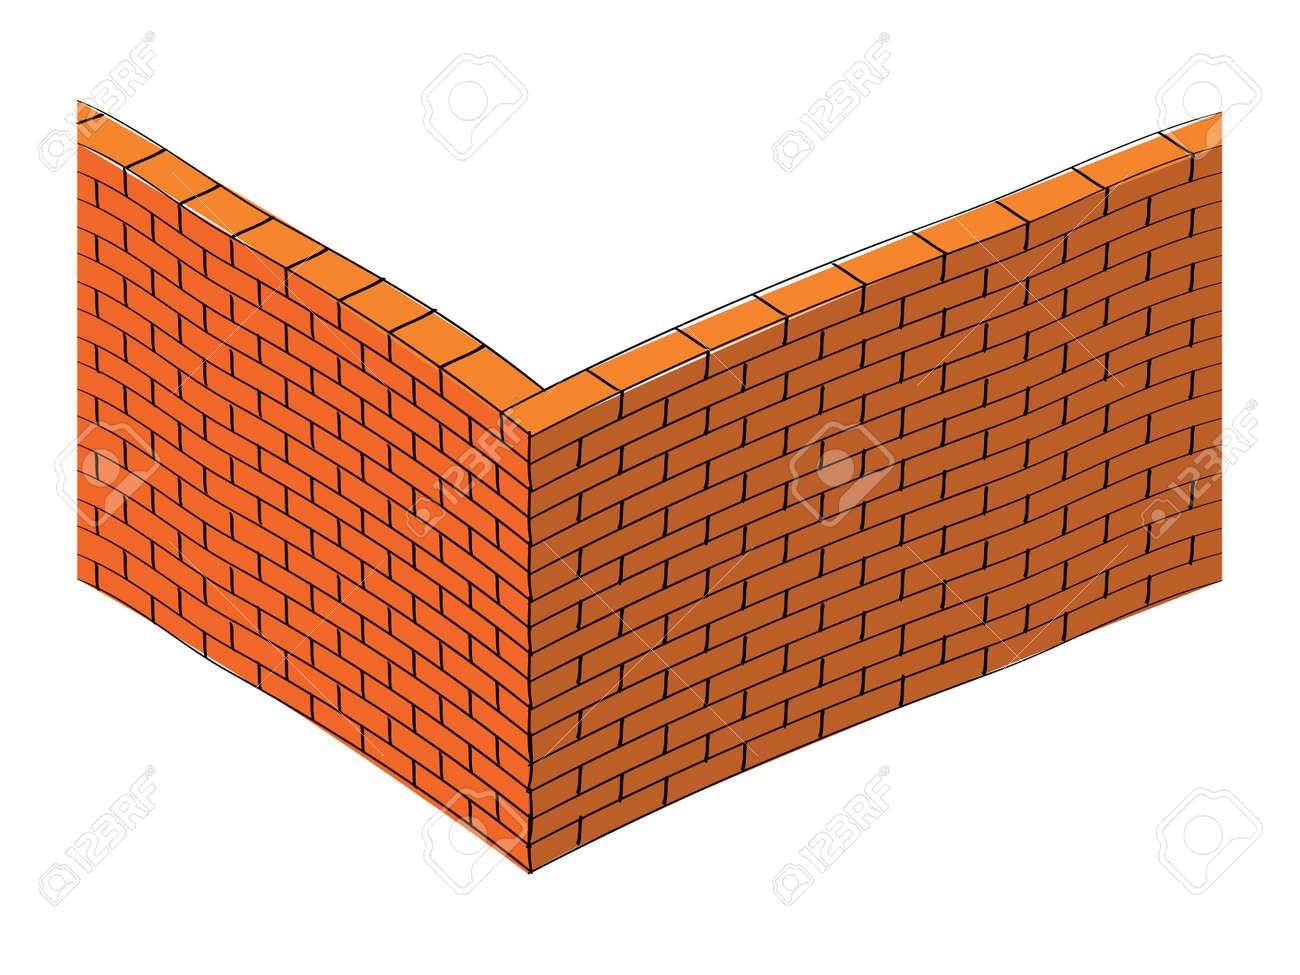 3d brick wall illustration